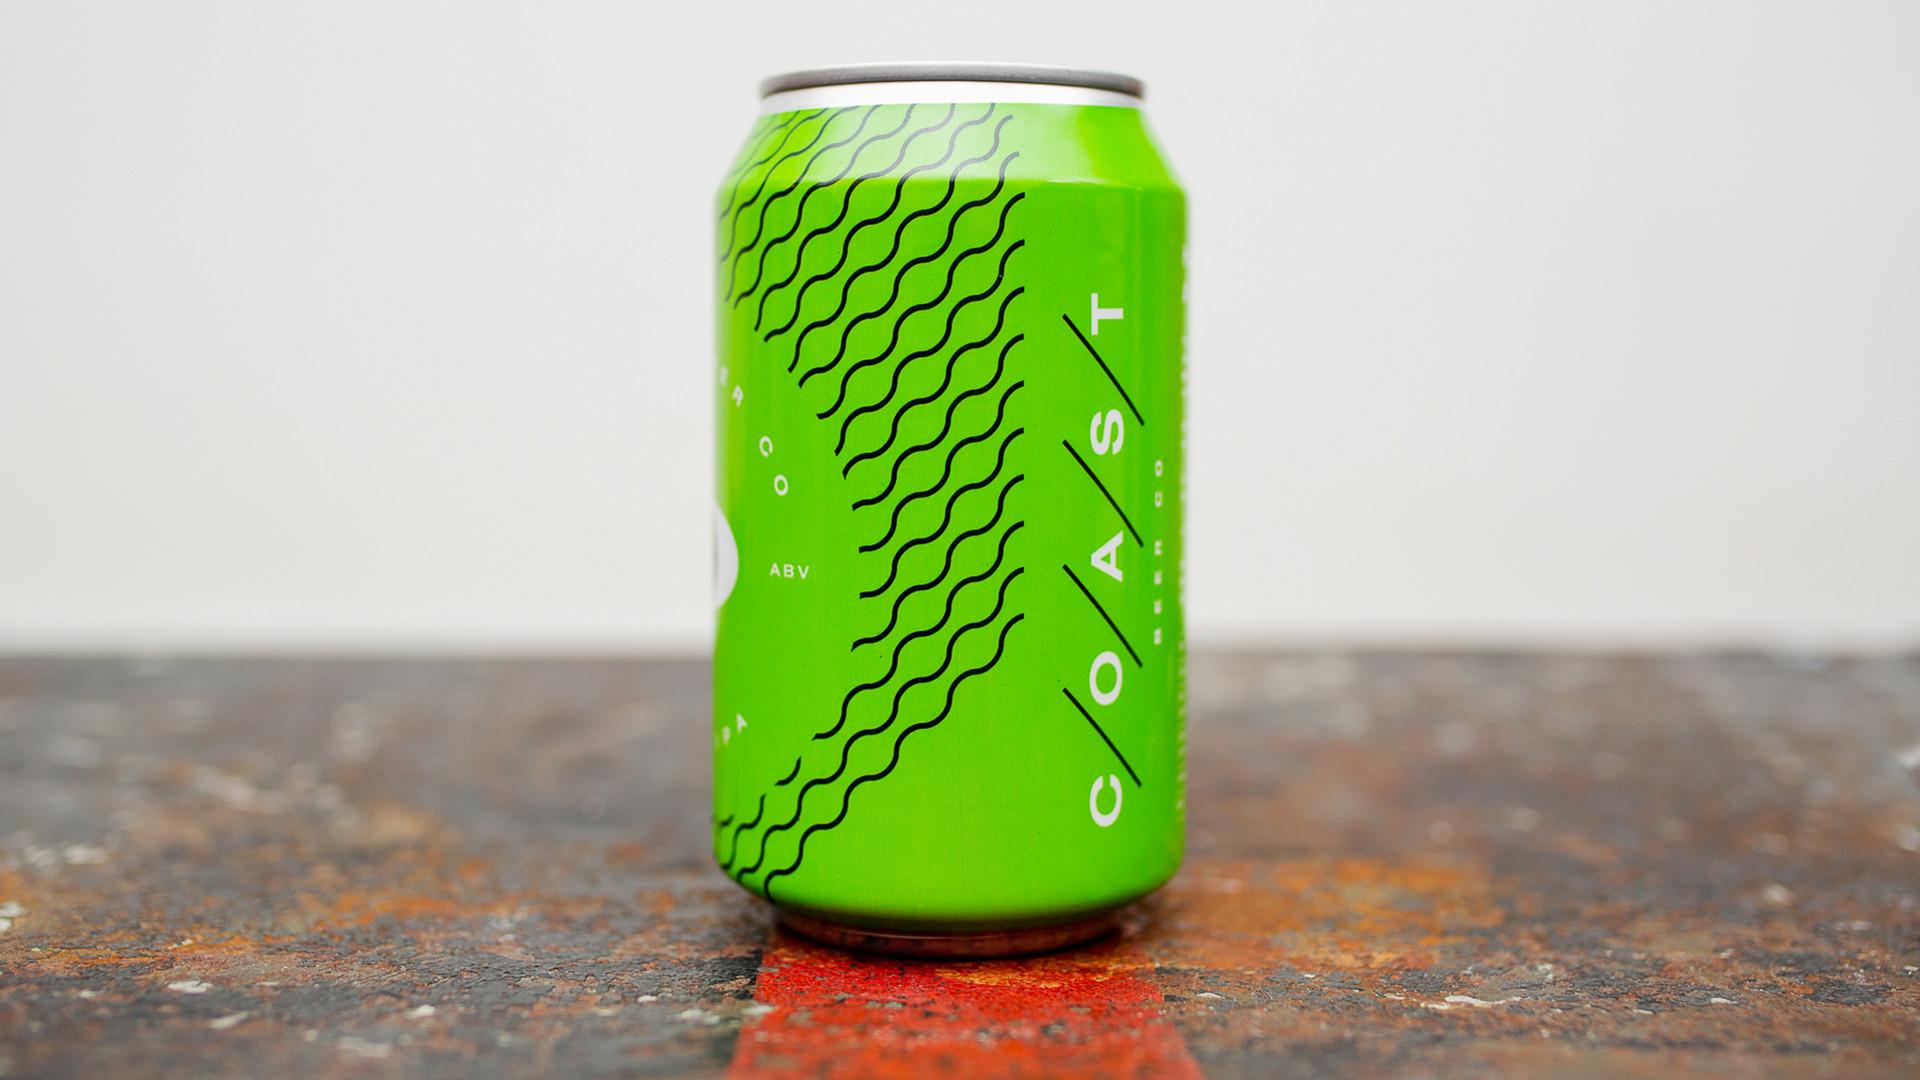 Non Alcoholic Beers London – Coast Beer Co's Hazy IPA – 0.0% ABV